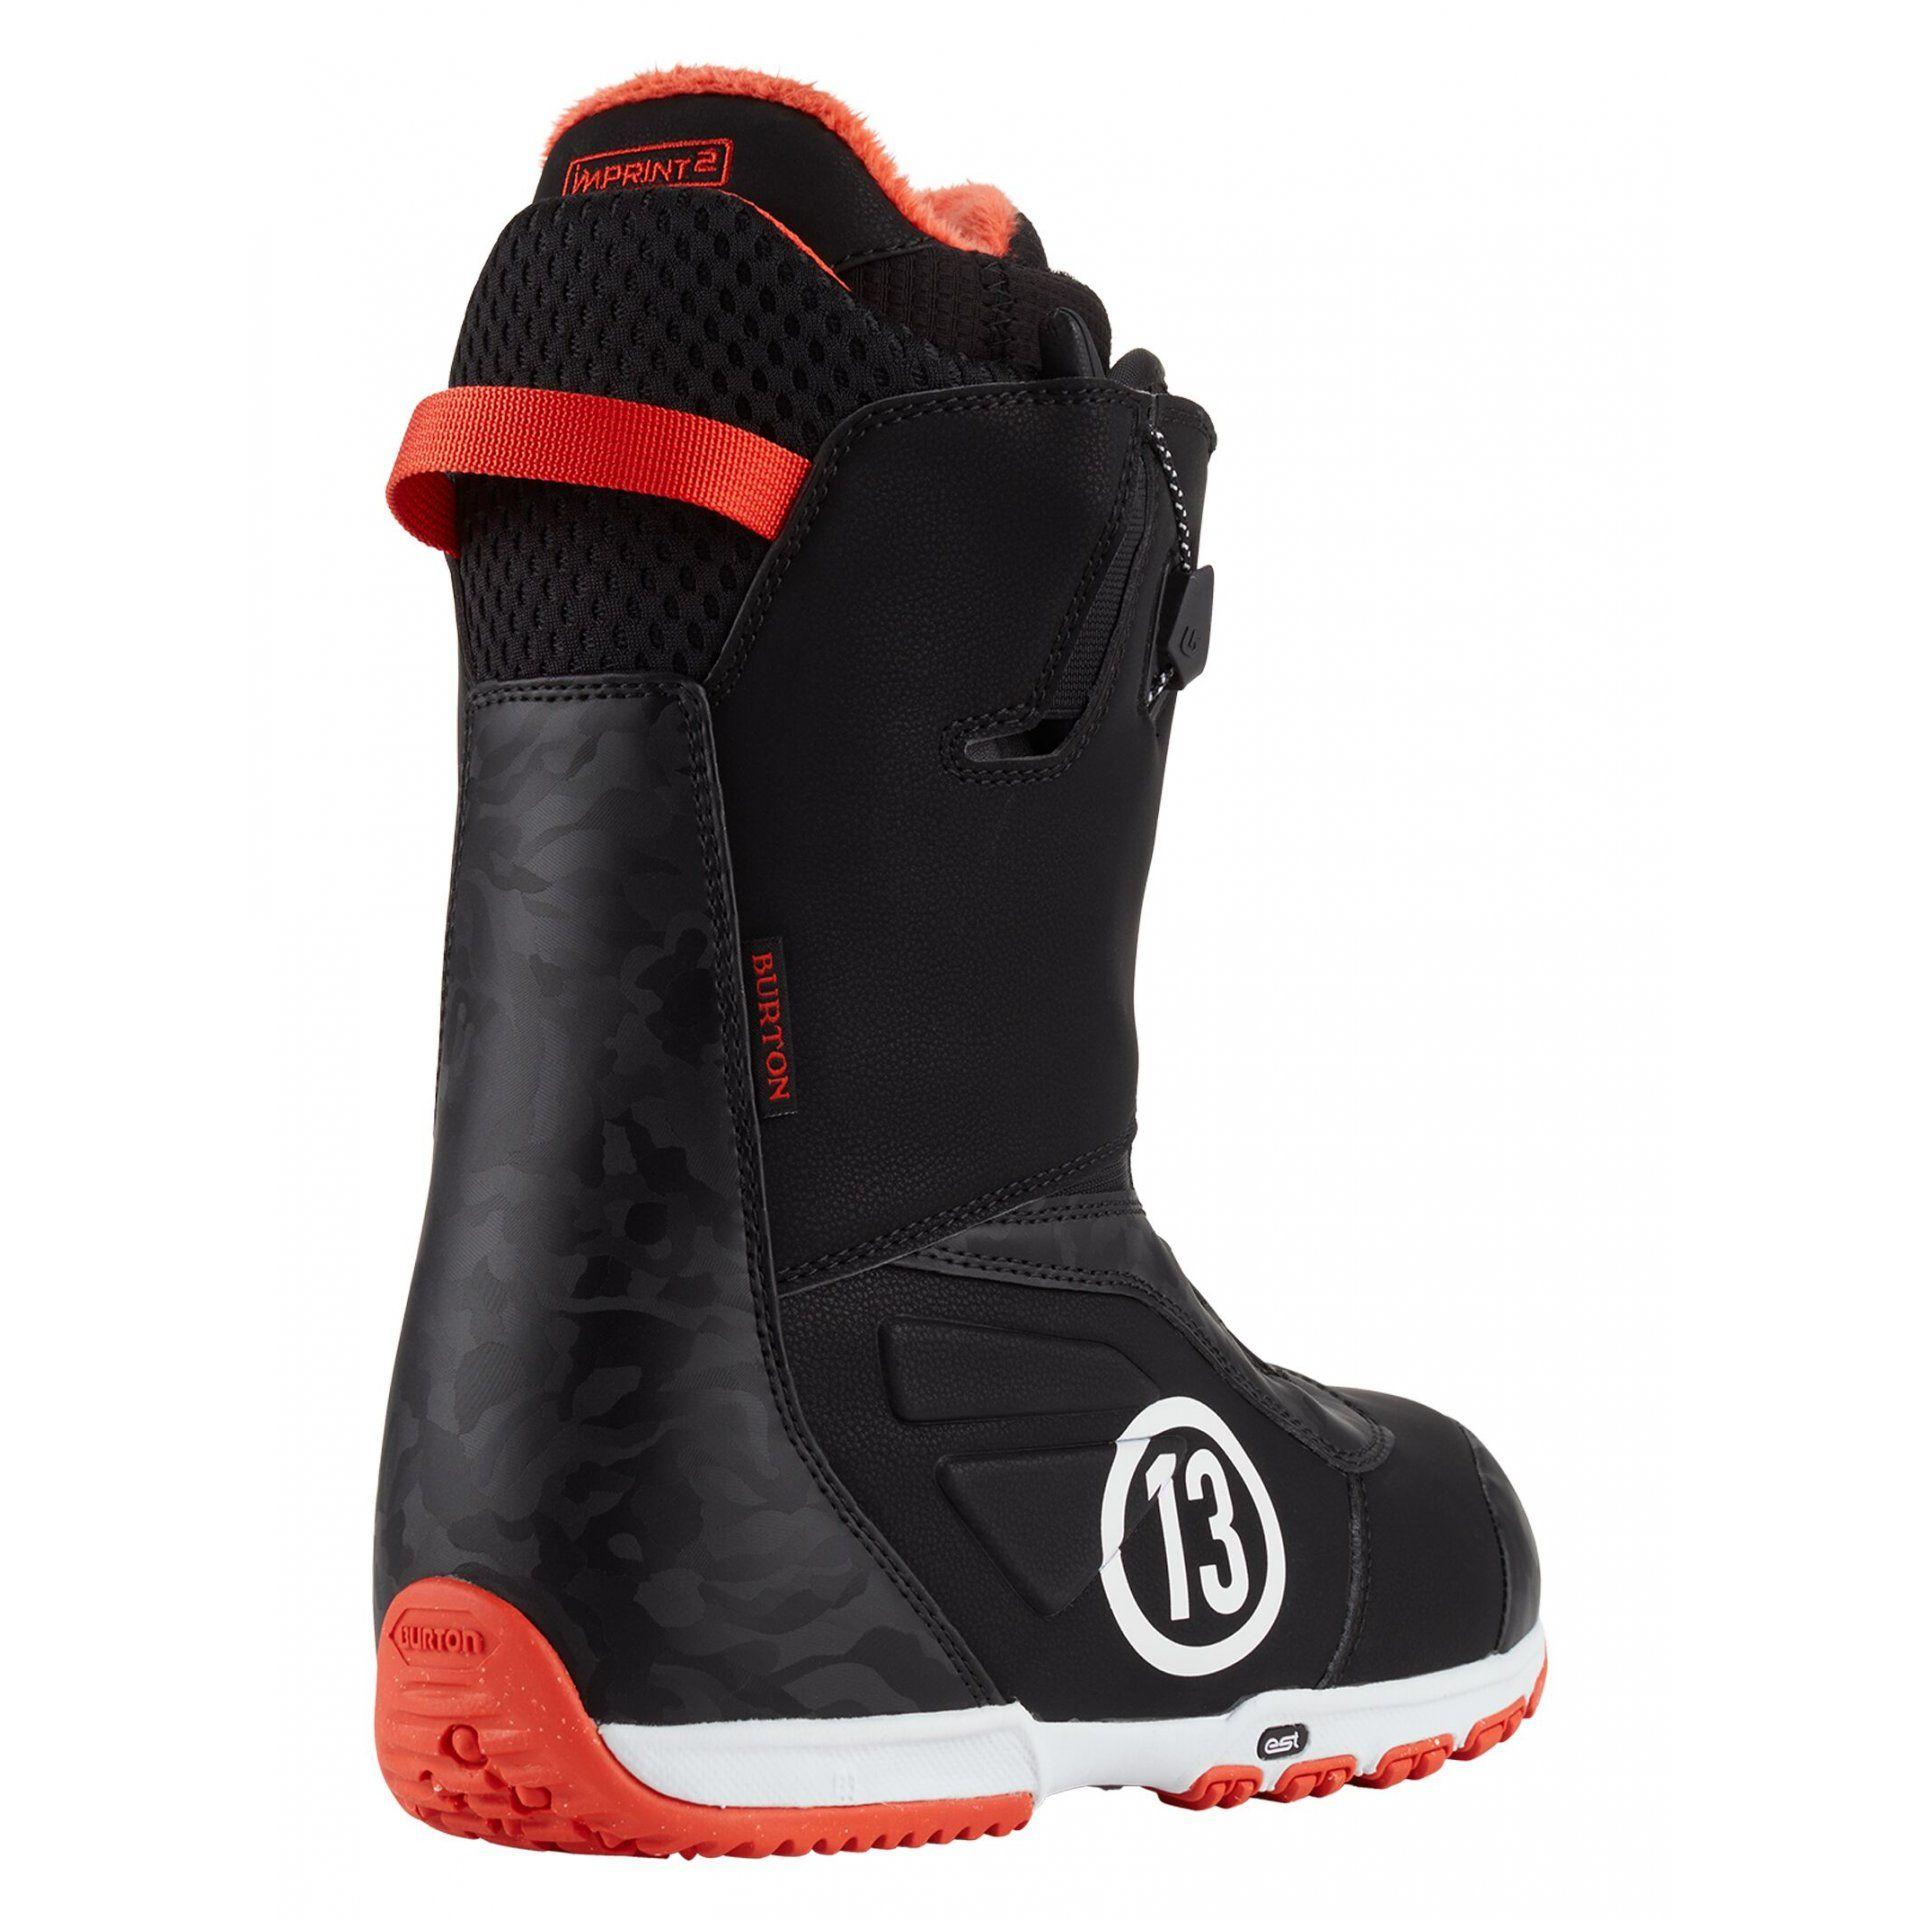 BUTY SNOWBOARDOWE BURTON RULER 104391-020 BLACK RED 2